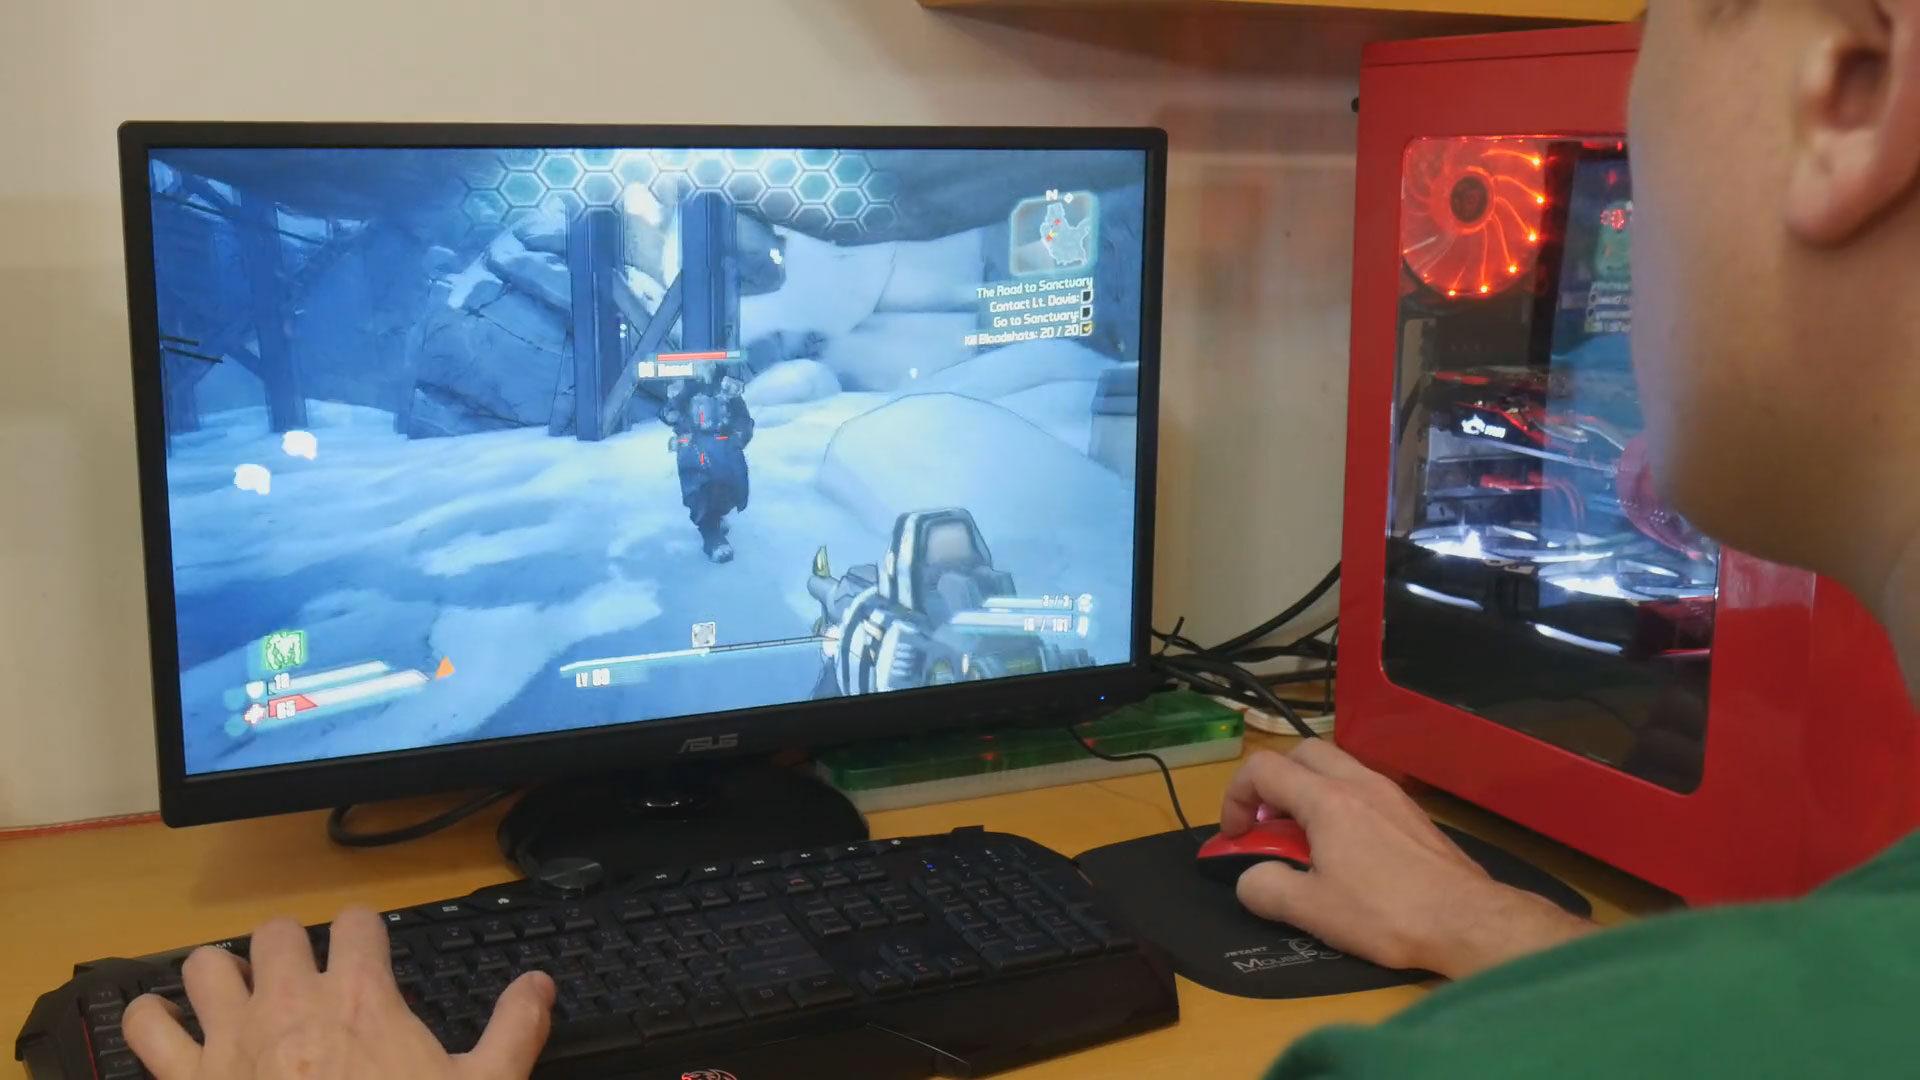 Asus VA249 monitor 7